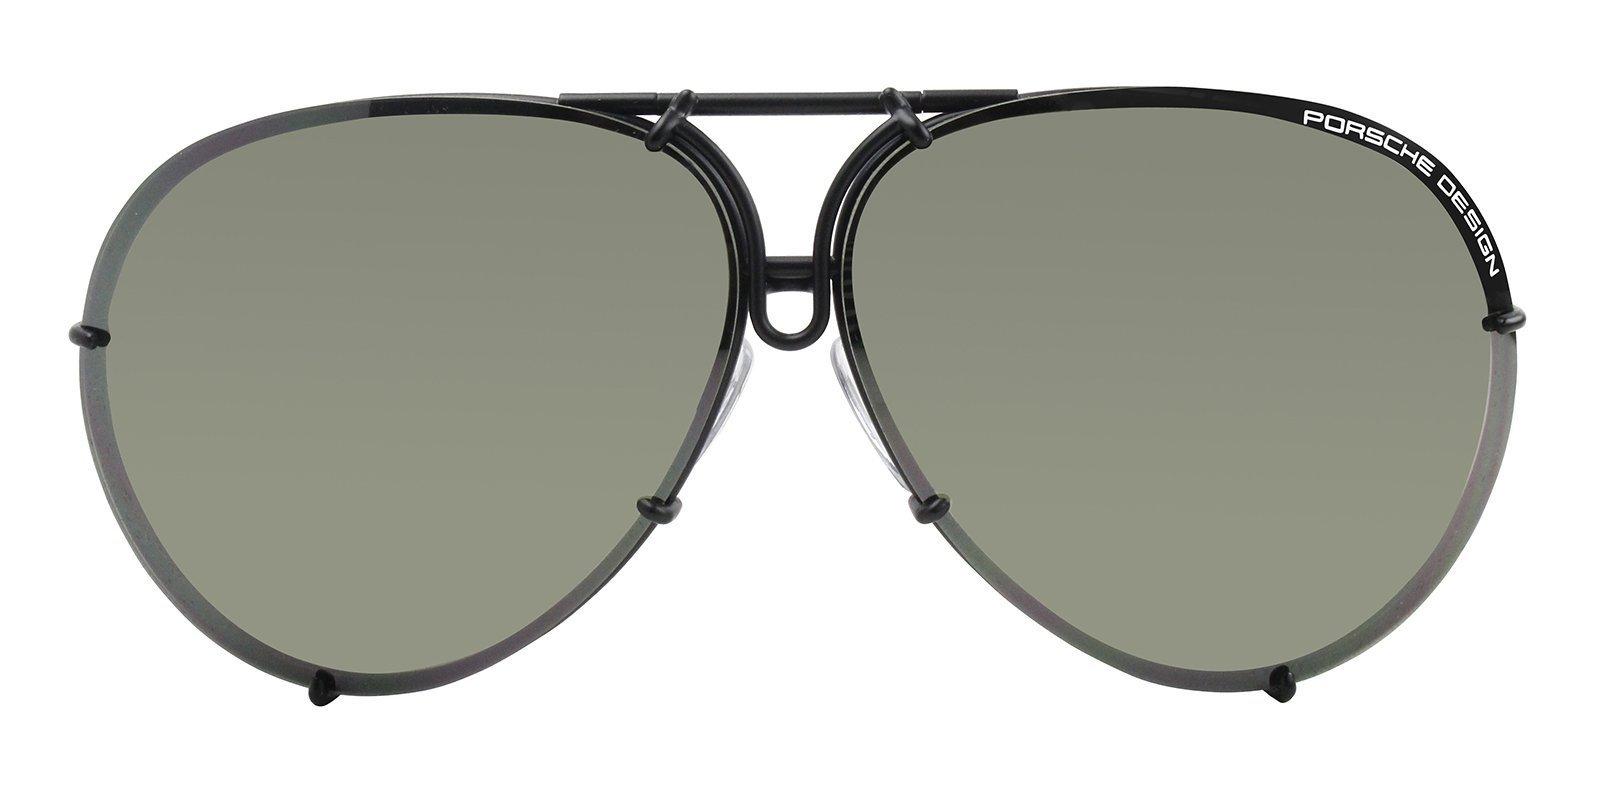 210e47568e1e porsche-design-sunglasses-porsche-design-p8478-black-black-designer ...